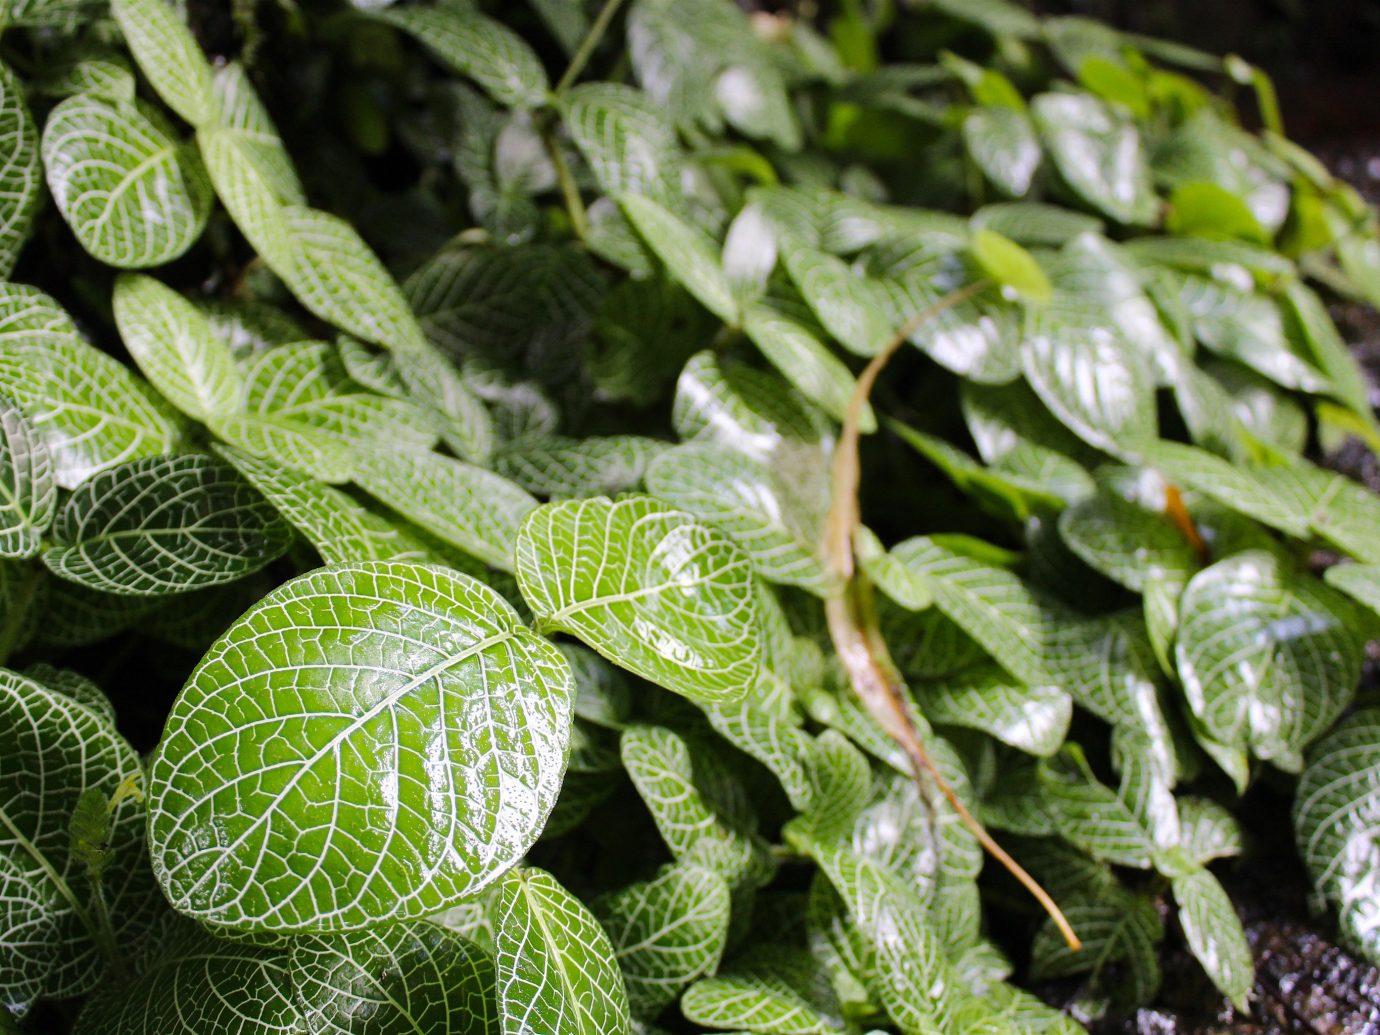 Trip Ideas green plant leaf flora botany flower land plant produce herb food flowering plant shrub close sliced fresh vegetable